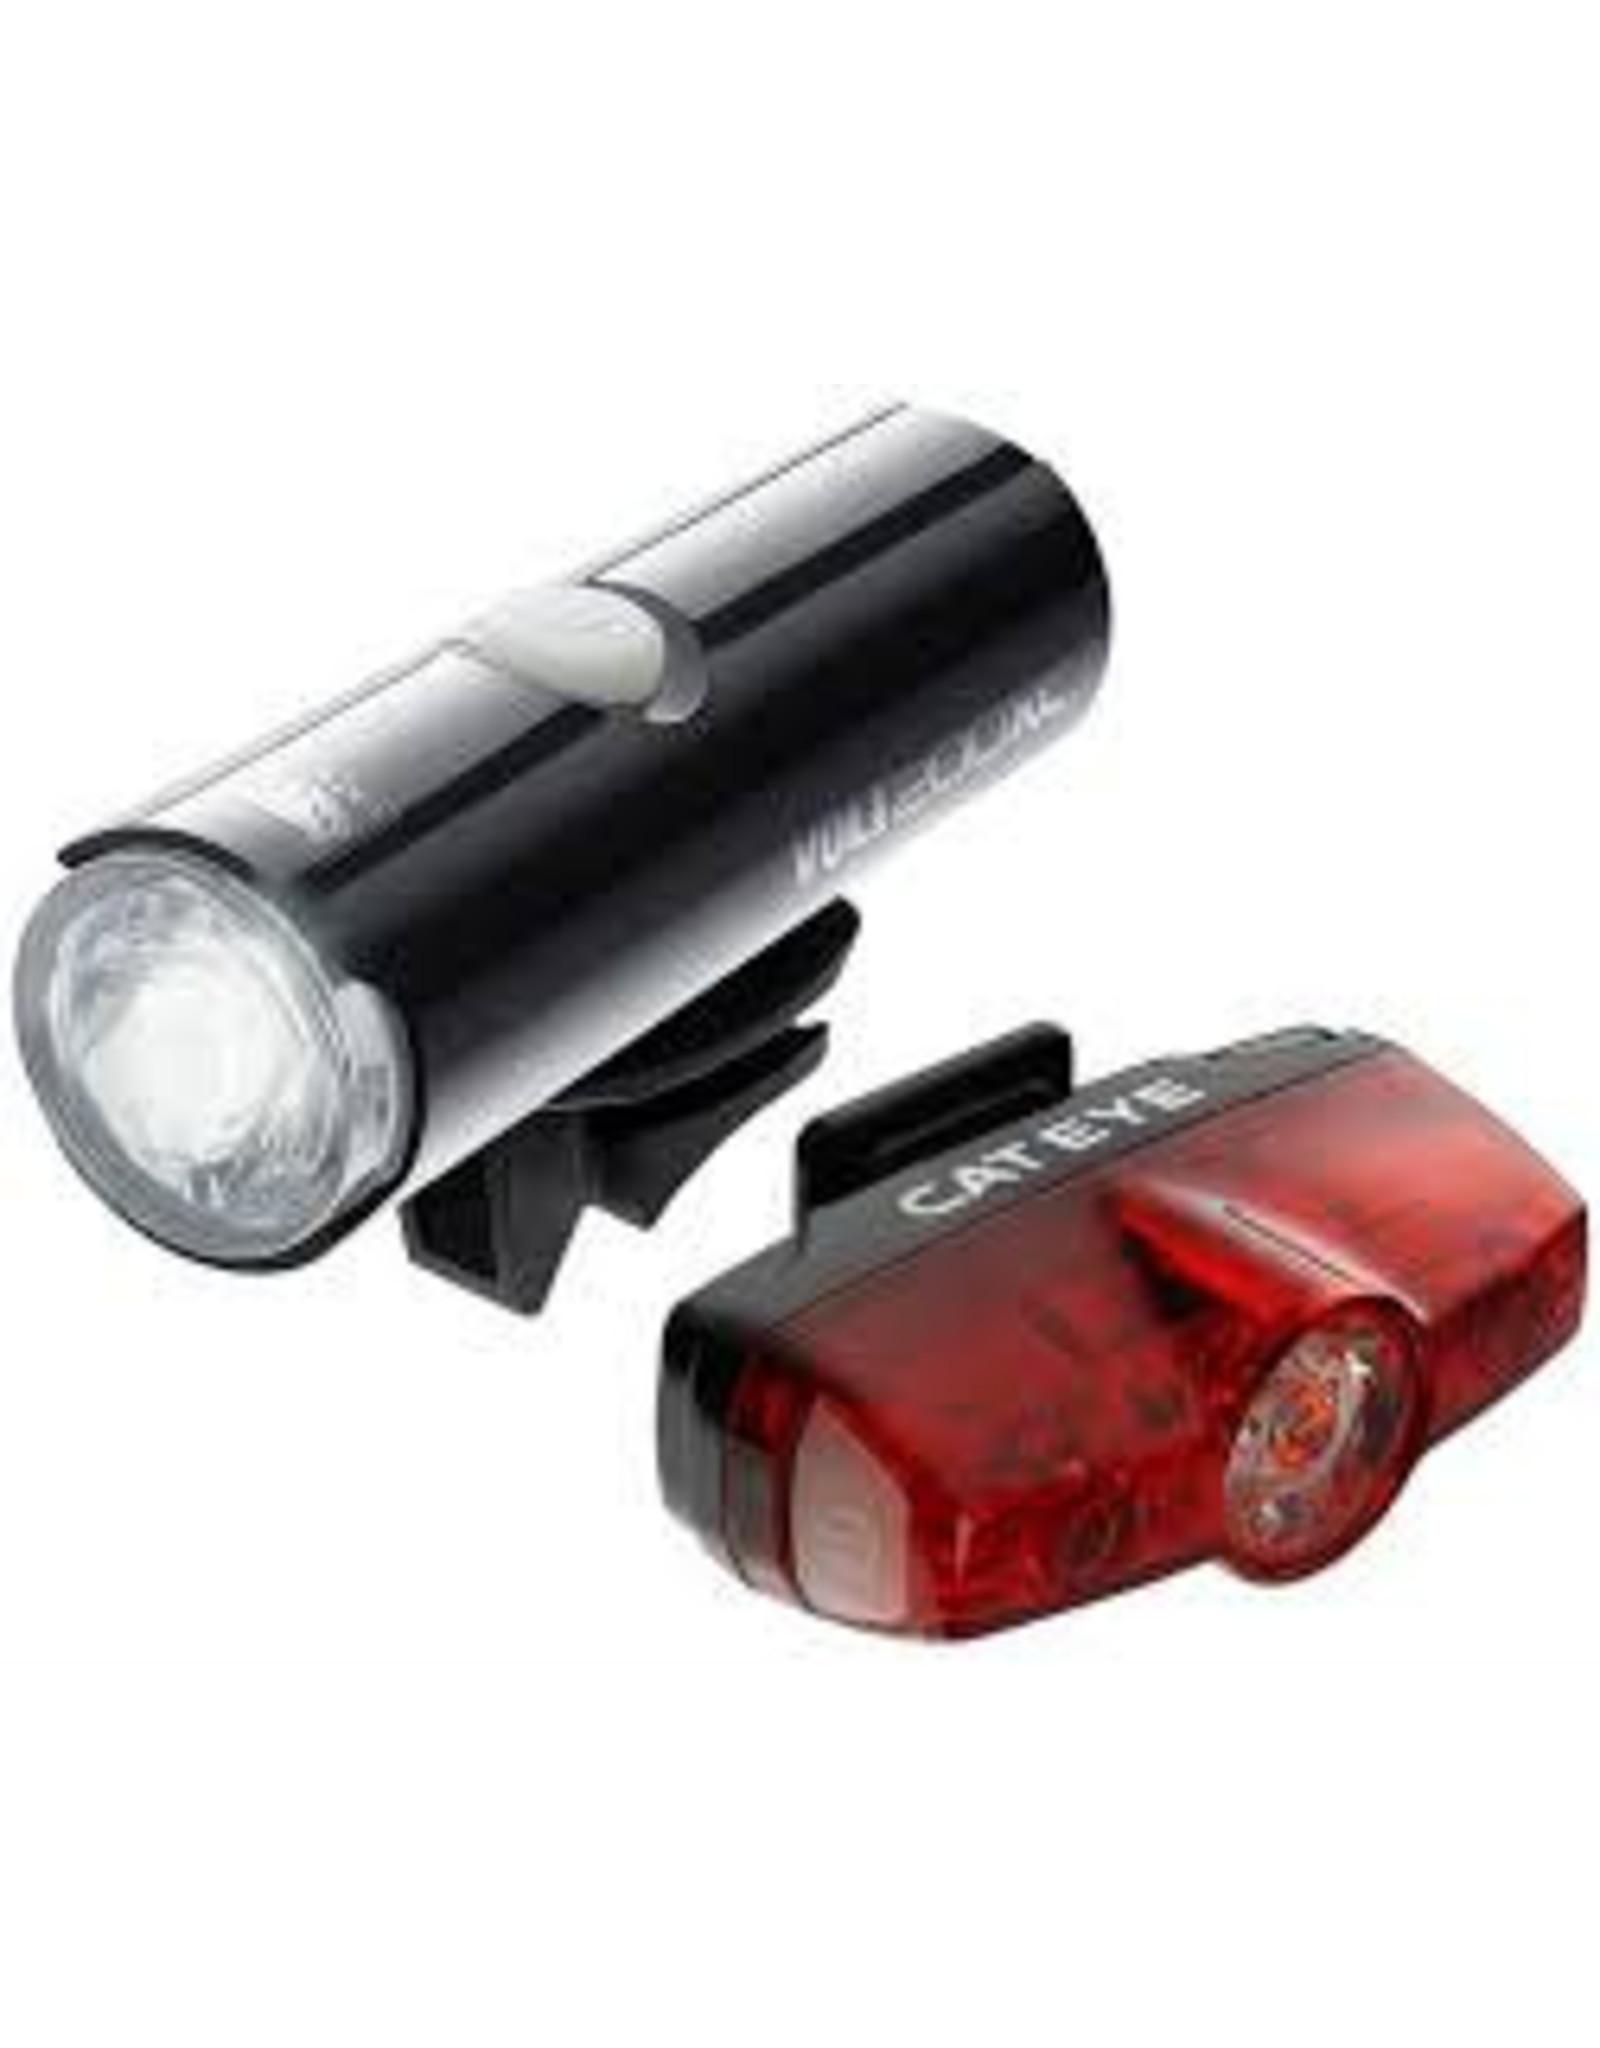 Cateye VOLT 80 FRONT LIGHT & RAPID MICRO REAR LIGHT USB RECHARGEABLE LIGHT SET: